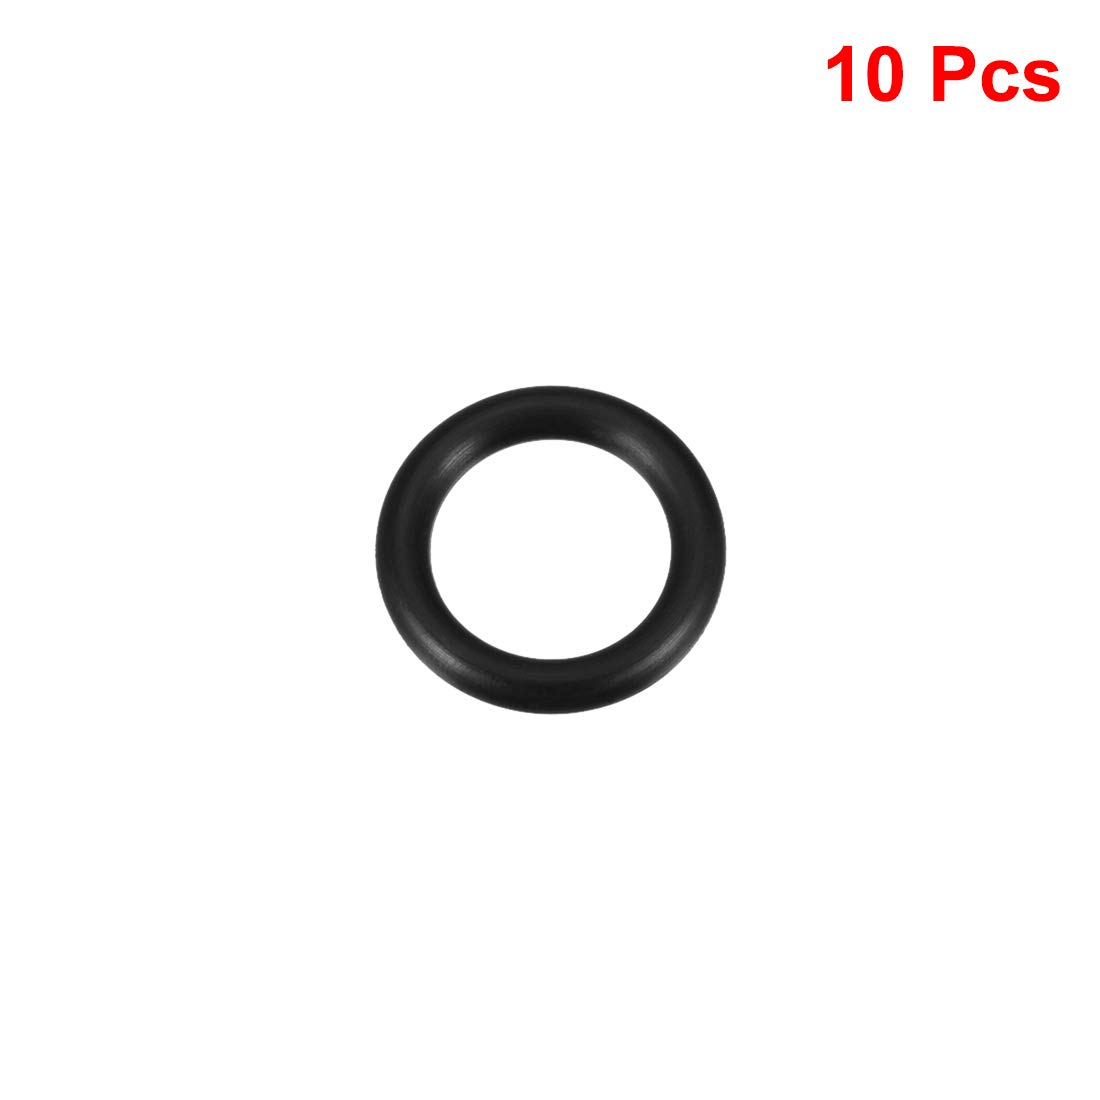 junta de sello redondo Sourcingmap junta t/órica de goma de nitrilo 25 mm de di/ámetro exterior 4 mm de ancho 17 mm de di/ámetro interior paquete de 5